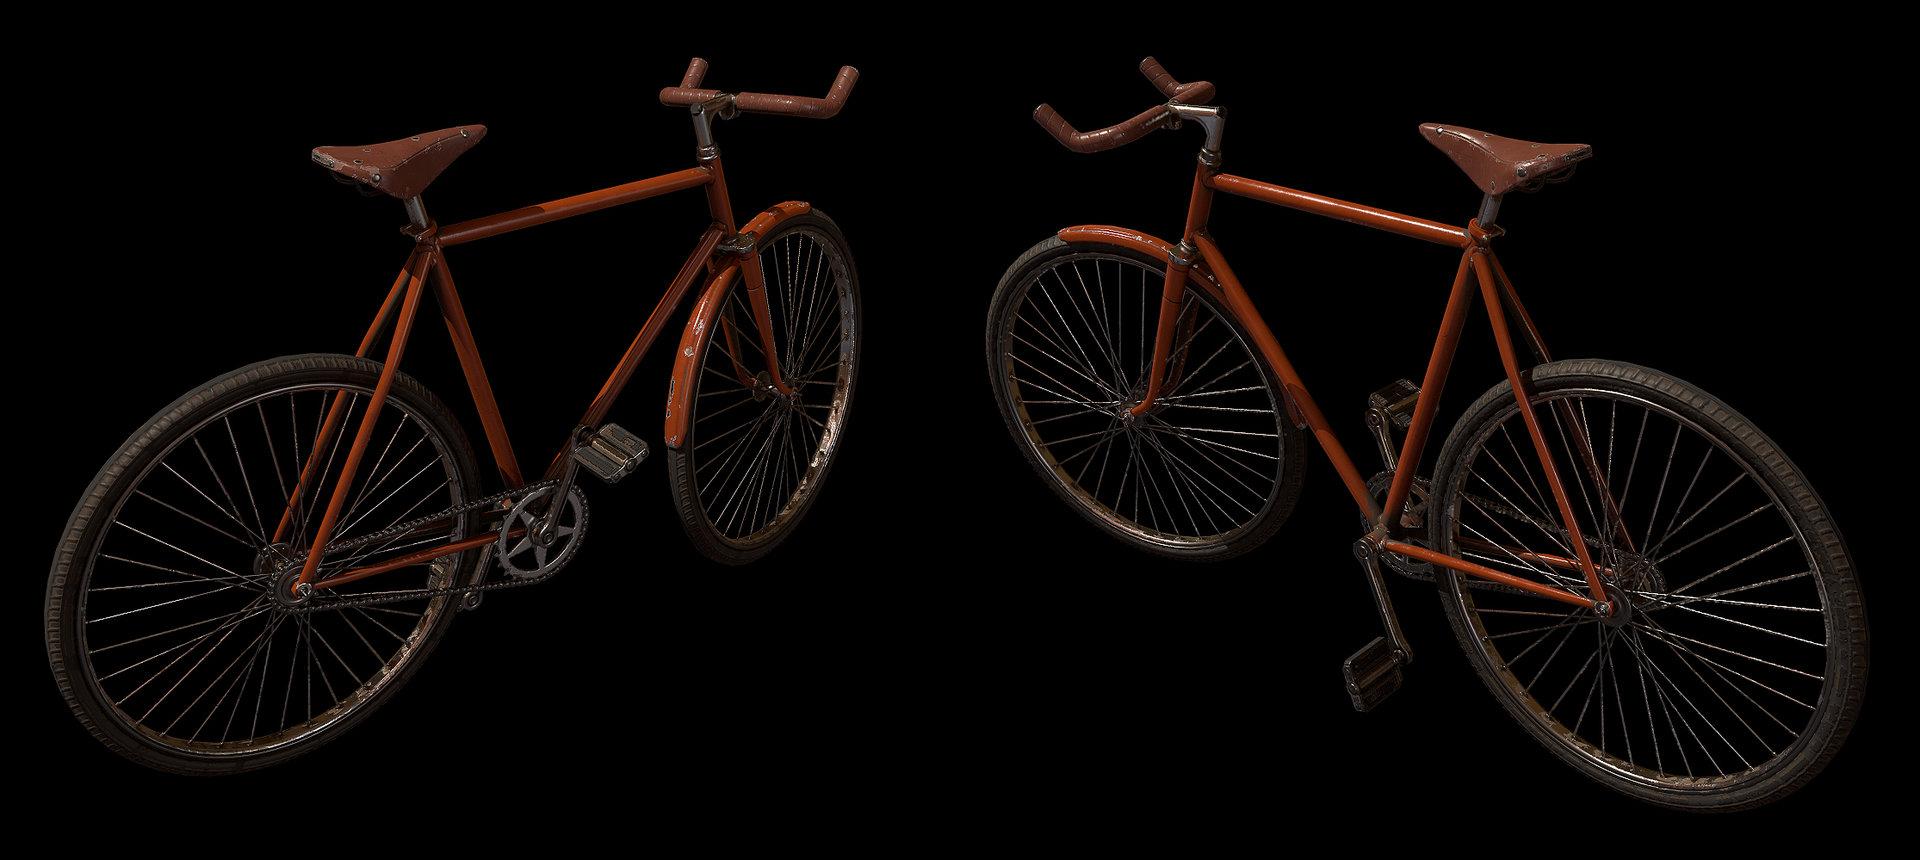 Liam tart bike 01